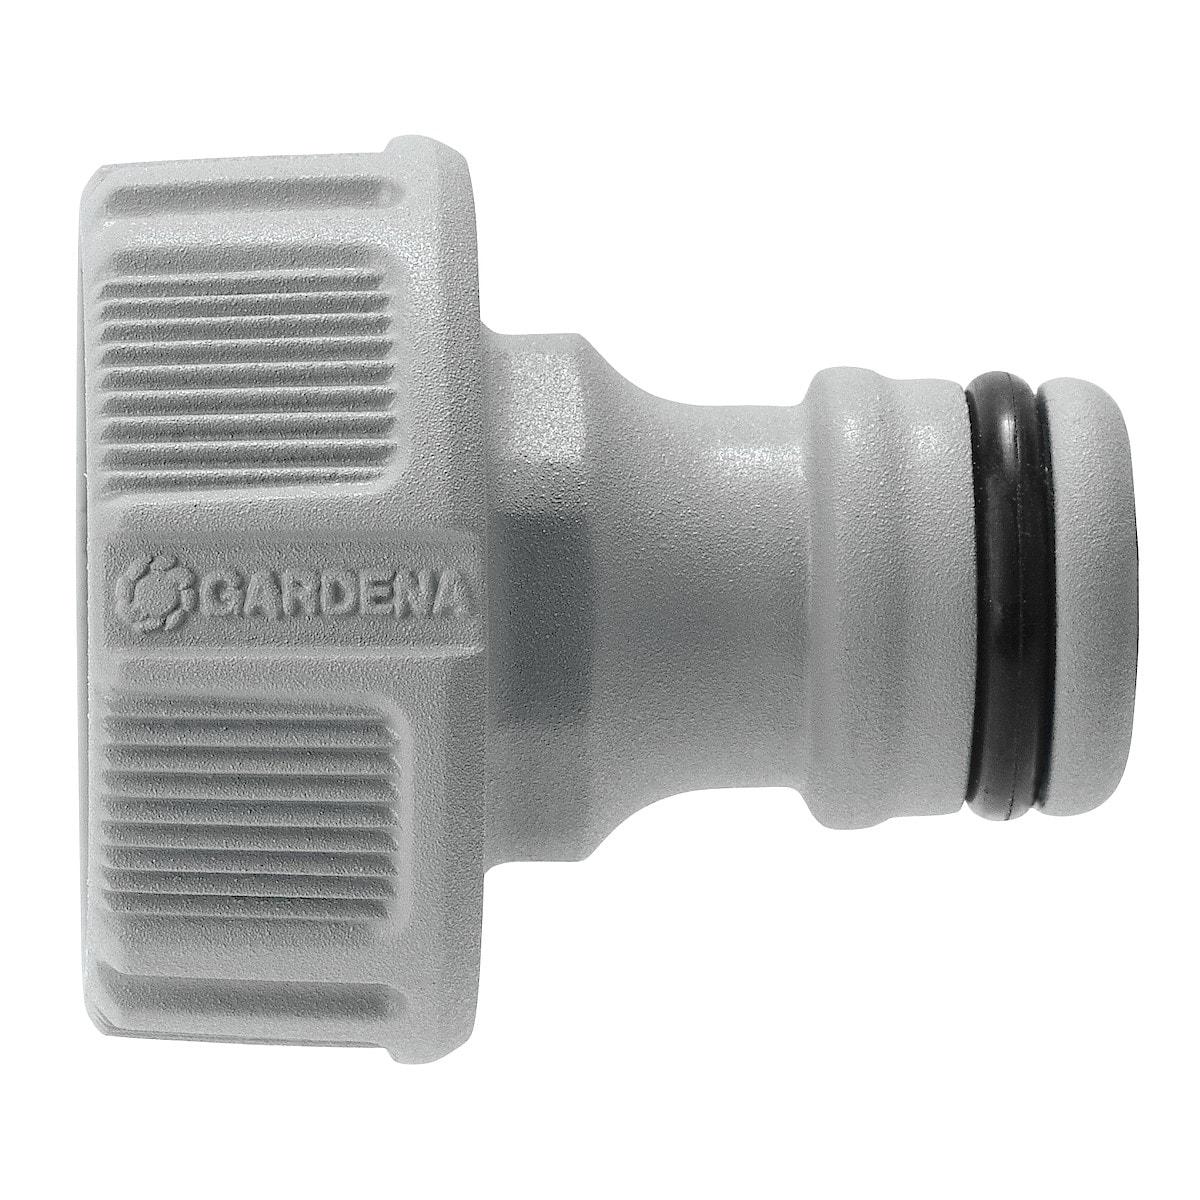 Gardena krankobling 26,5 mm (G3/4